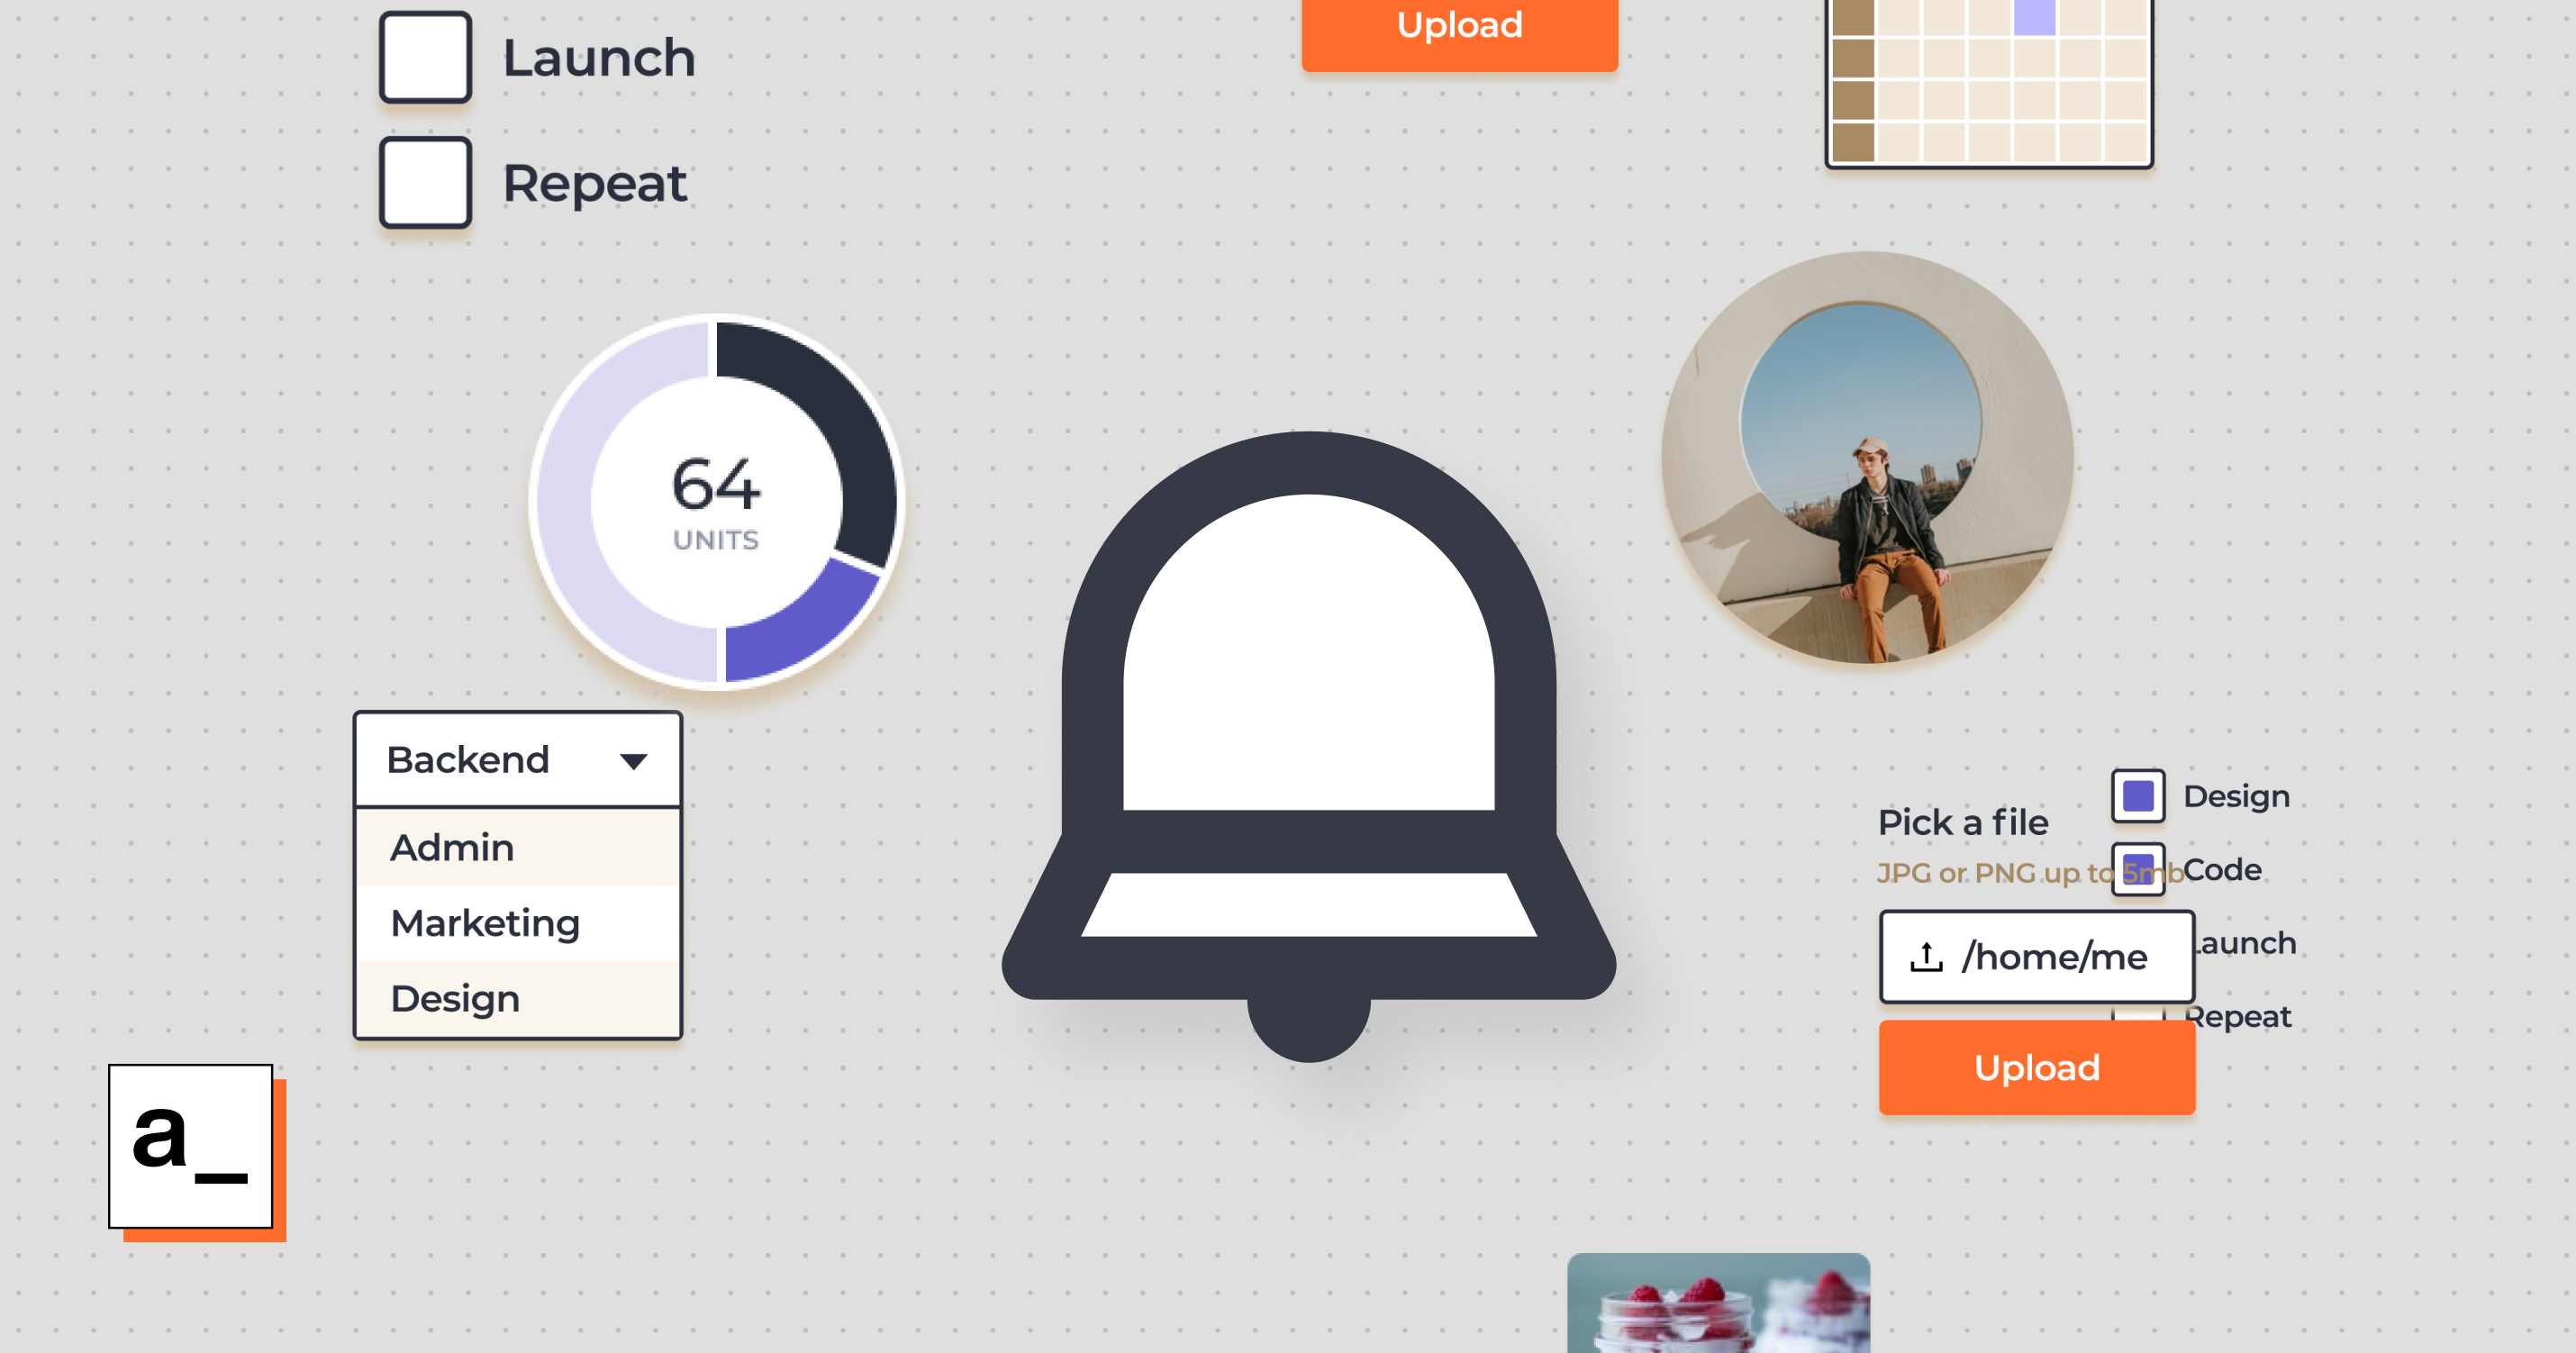 Appsmith Roundup: Powerful Widget Grouping Options, Undo-Redo, and New Widgets